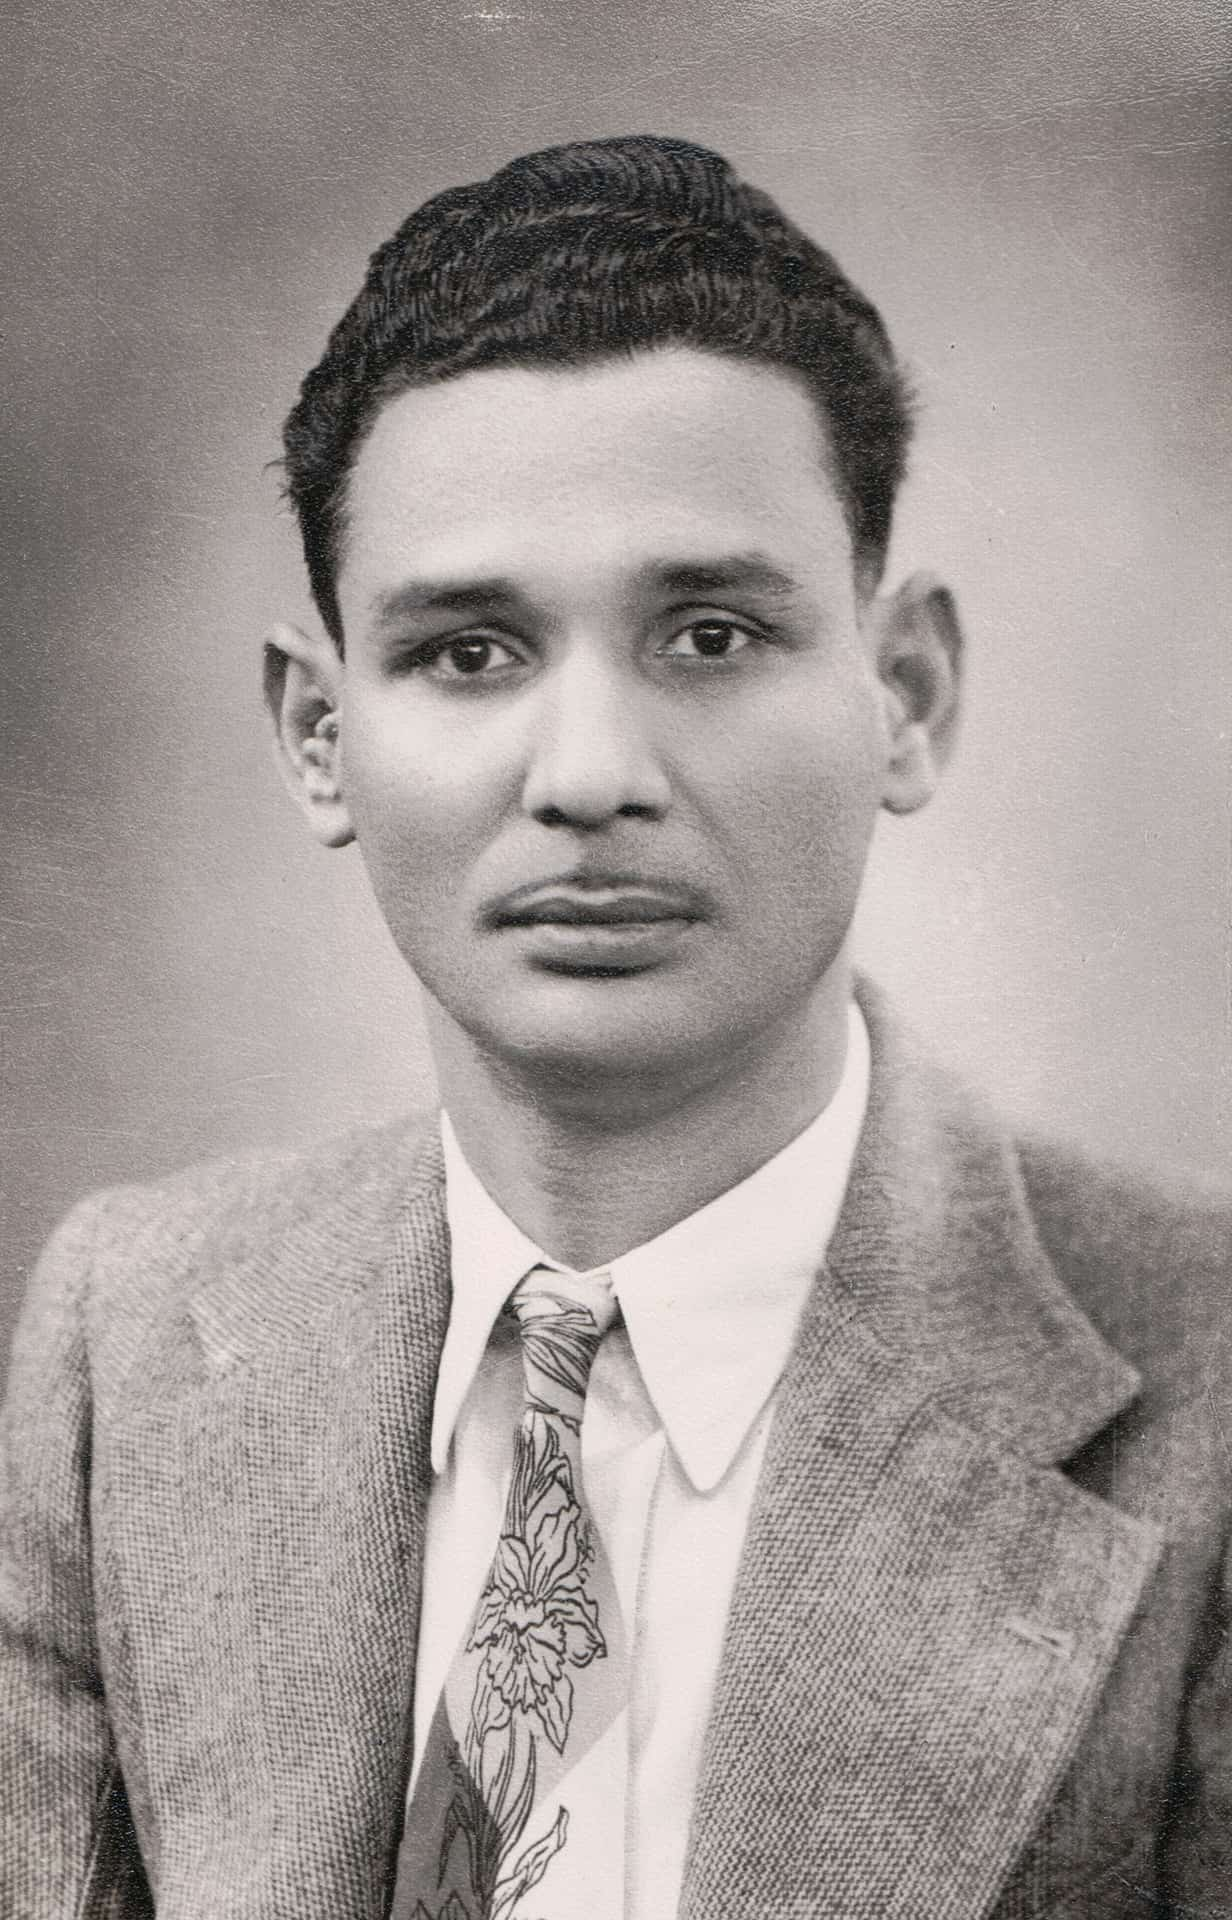 Marrianne's father Kenneth Mayor Monro. Taken in Calcutta, 1948.